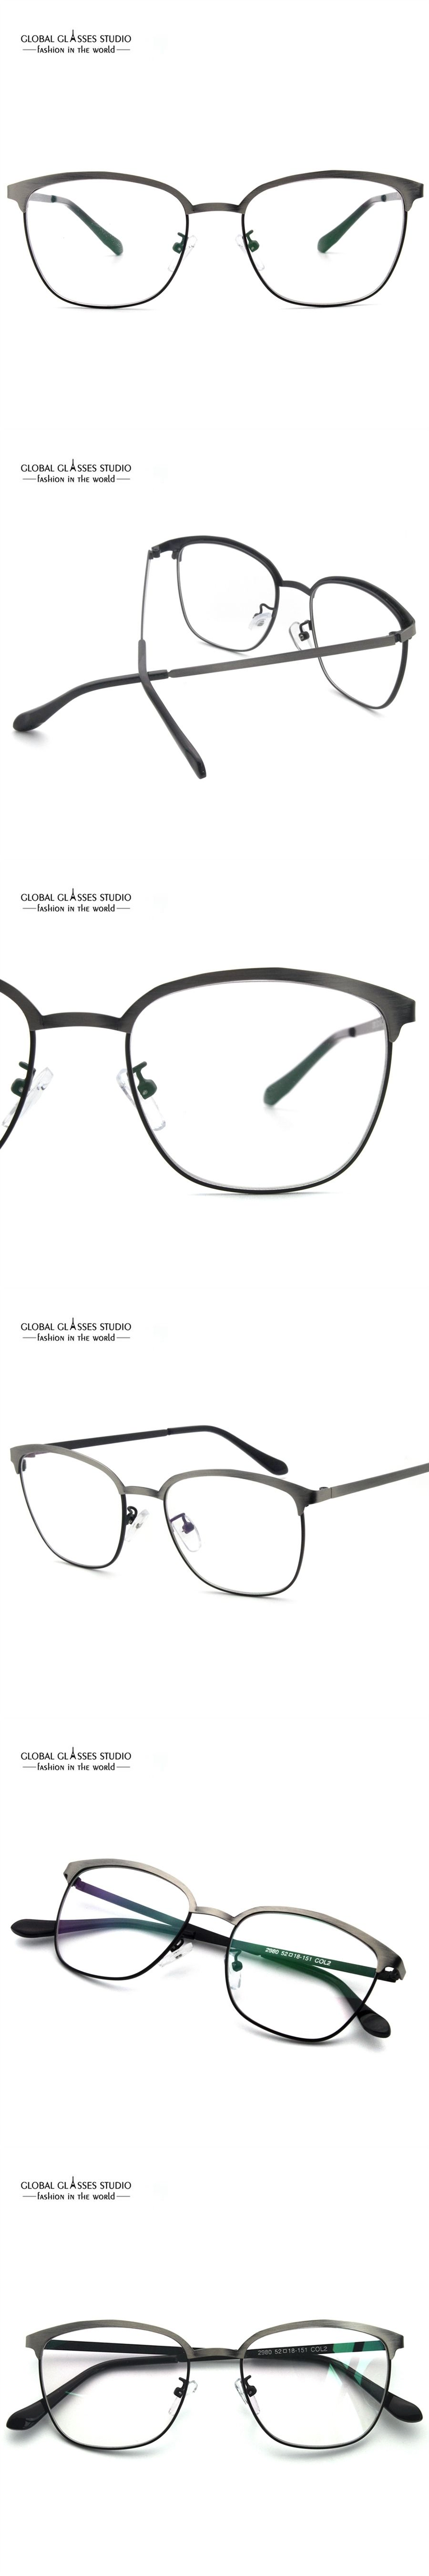 03f4c9cfc41 Latest Design Eyebrow Metal Glasses Brushed Color Precious Metal Optical  Frame Business Men Comfortable Spectacle Frame